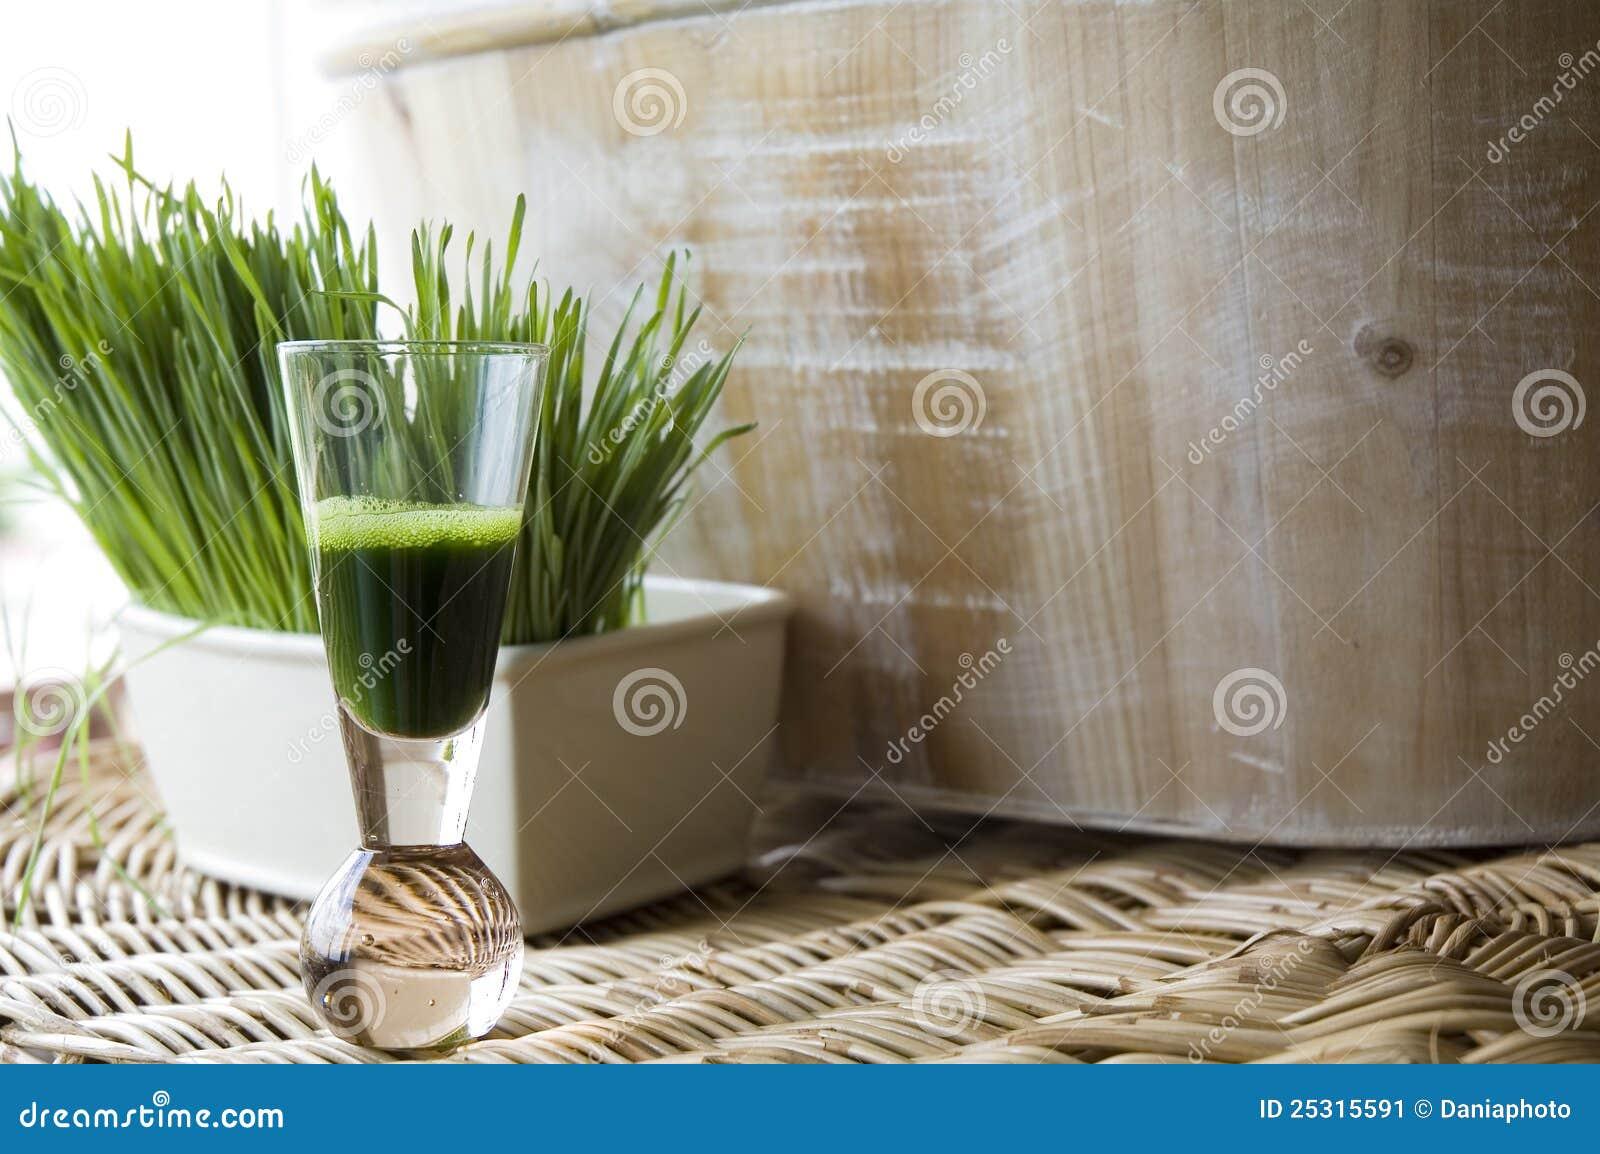 Natural wheatgrass shot